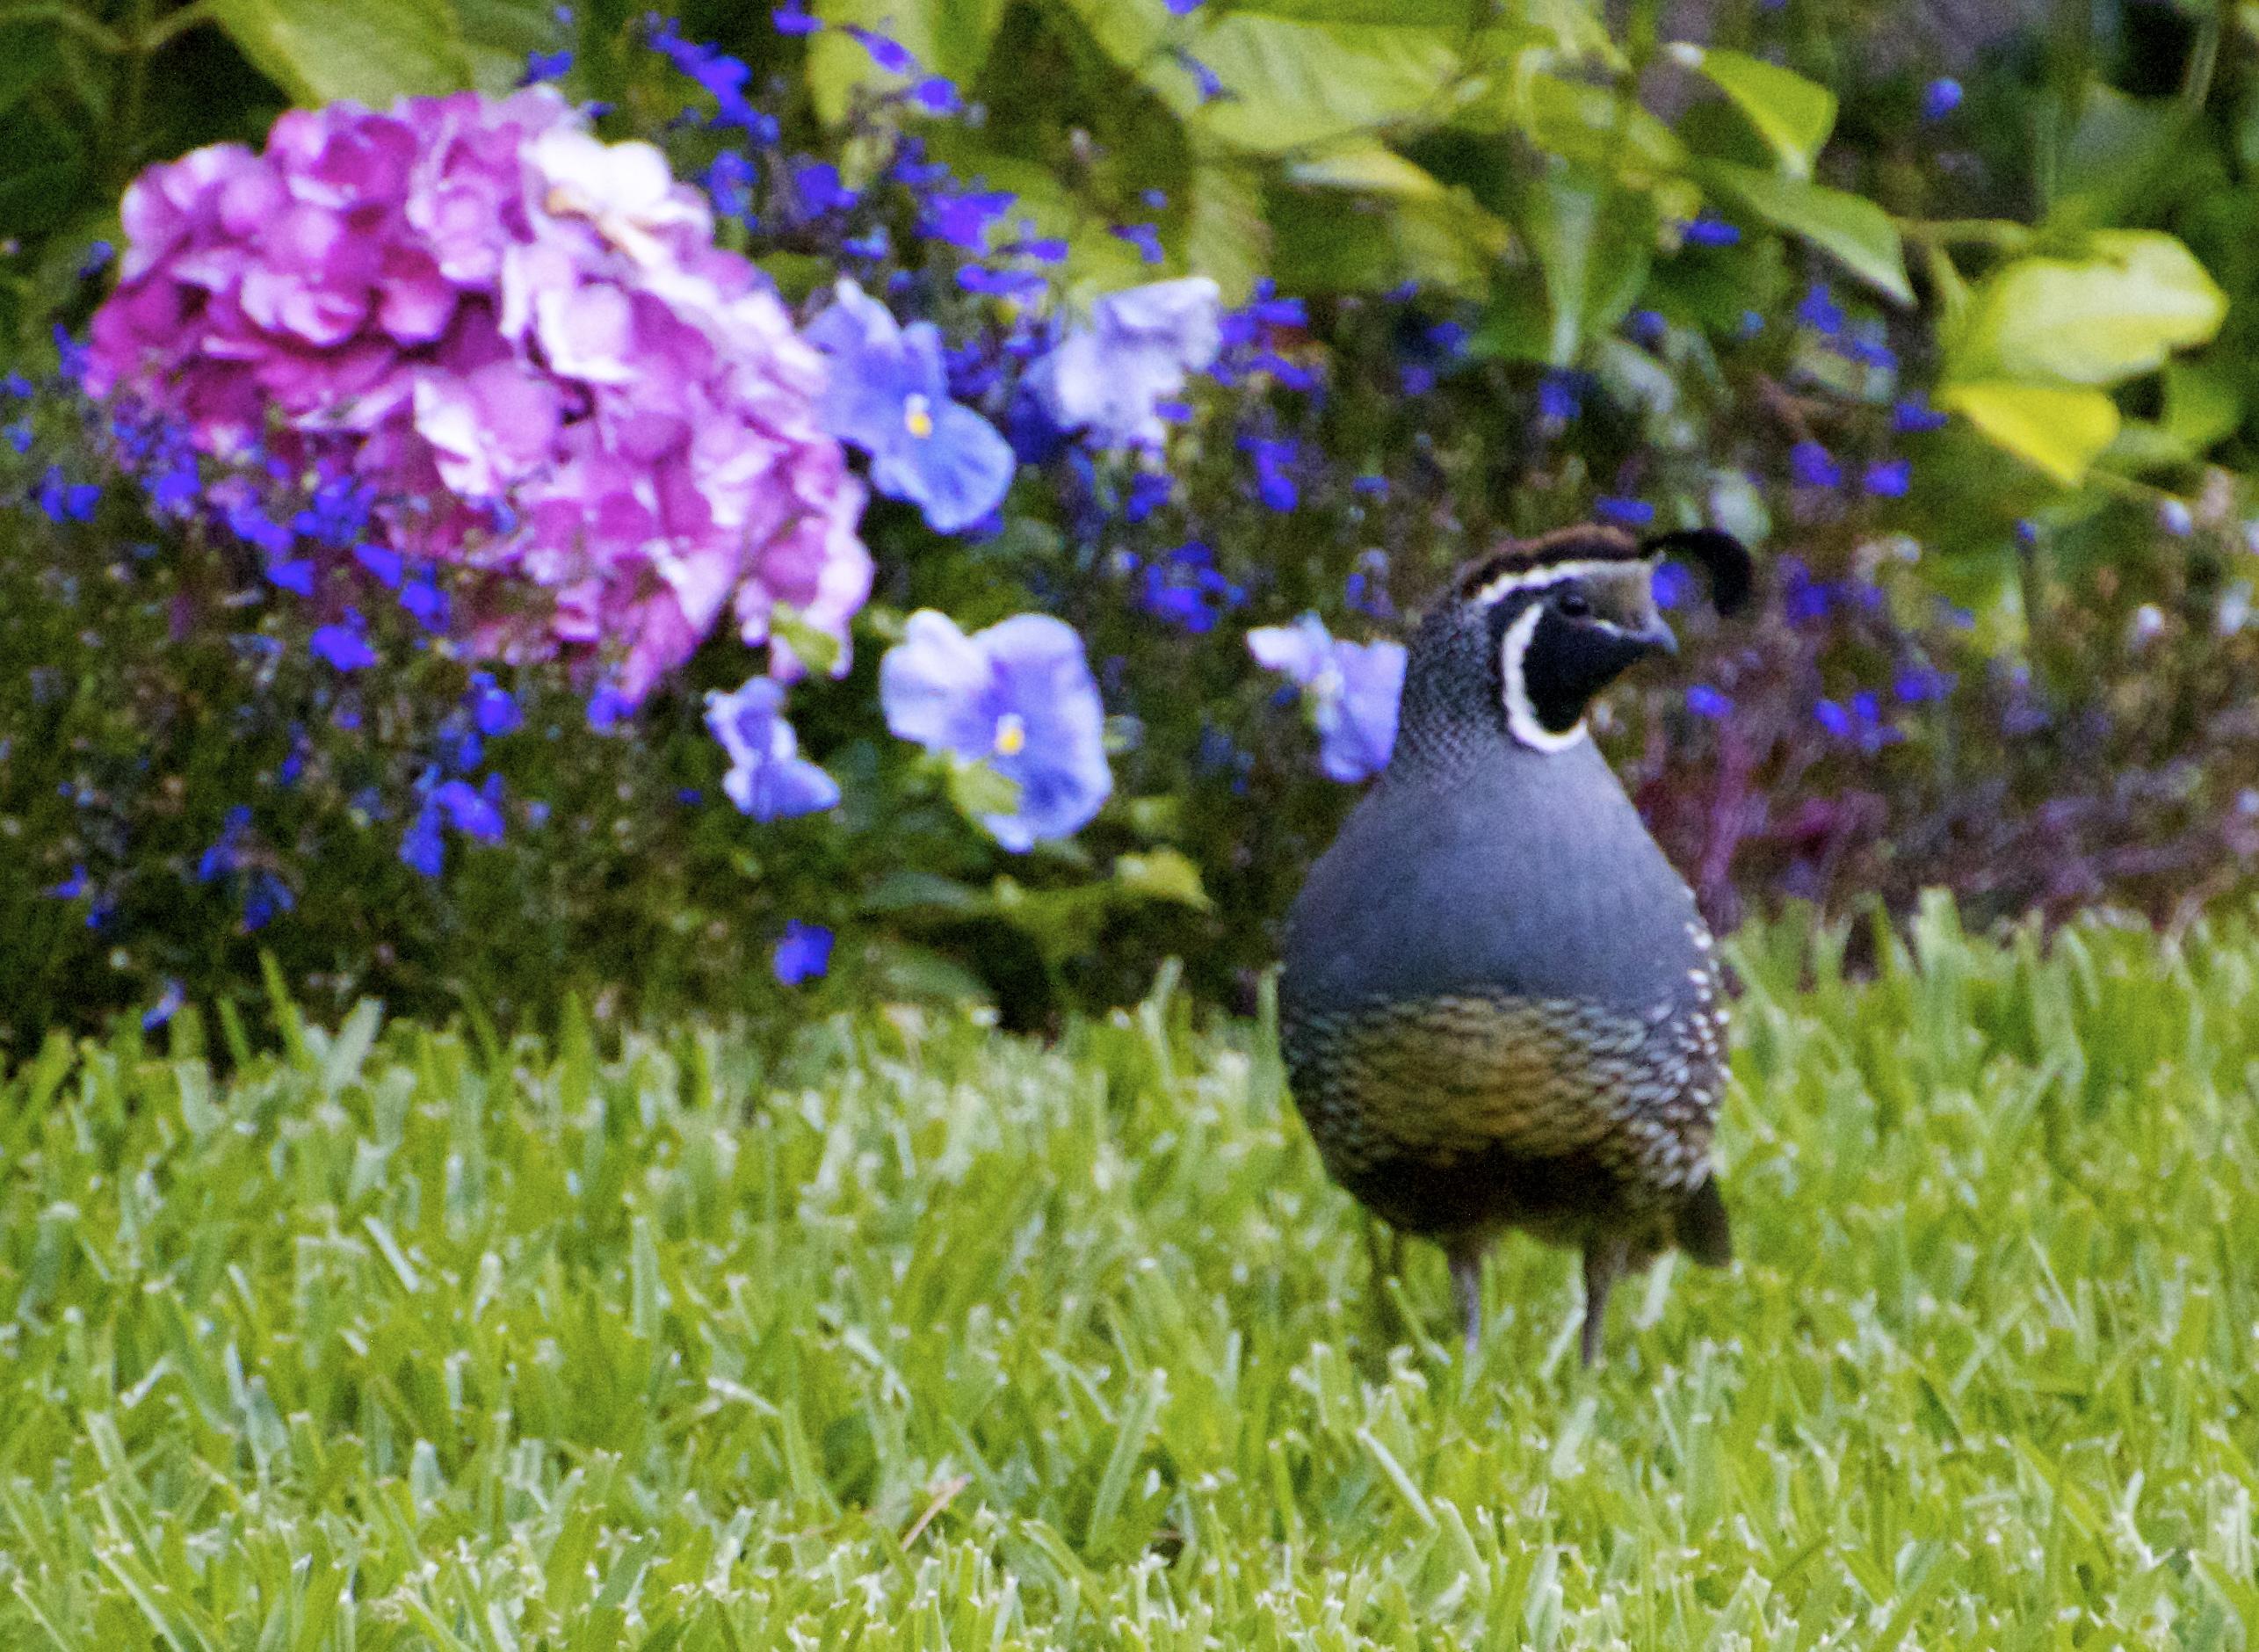 backyard quail featured in saqa june online gallery